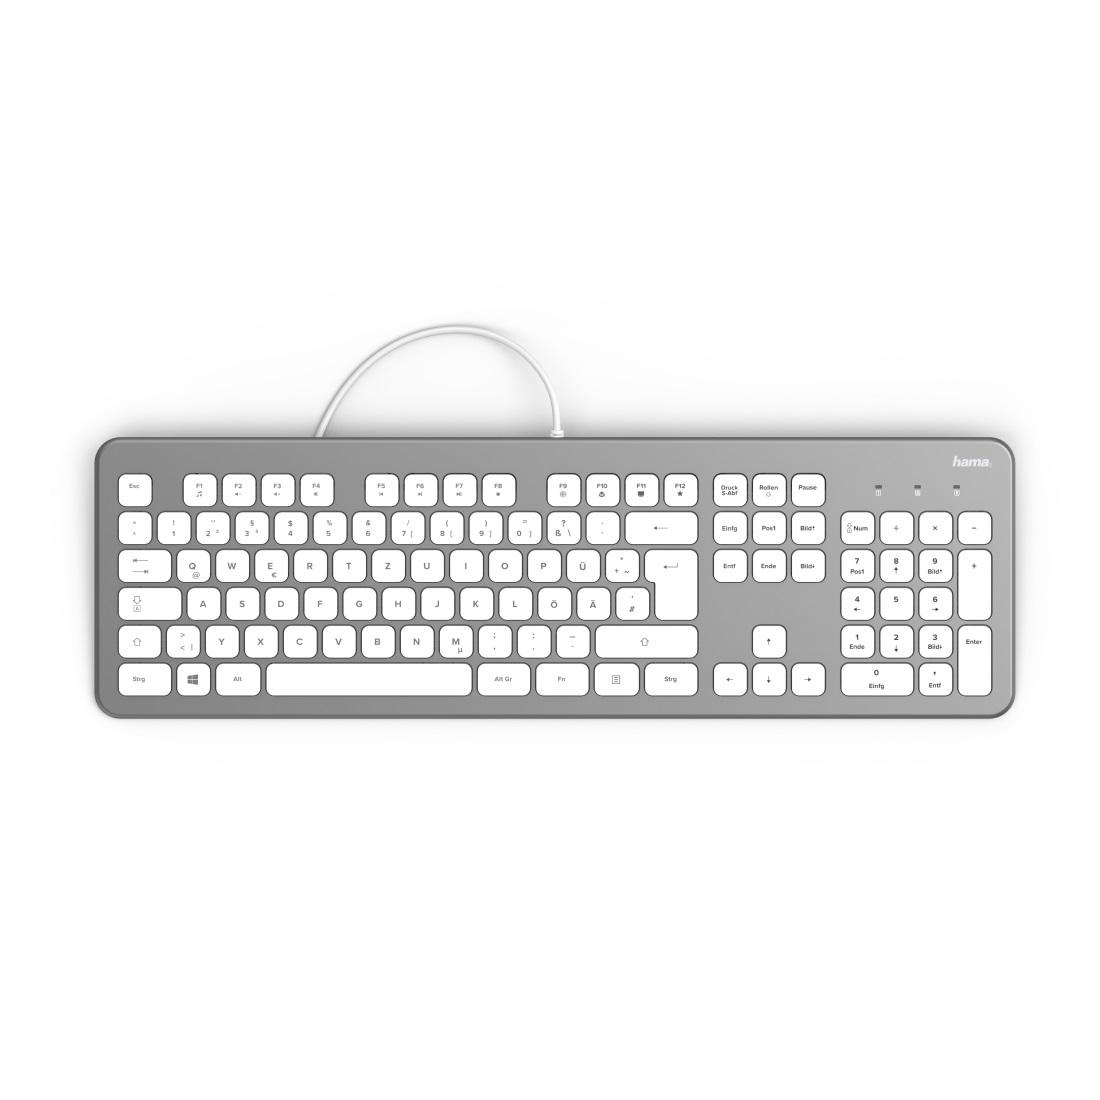 Клавиатура безшумна HAMA KC-700, с кабел, USB, кирилизирана, Сребрист/Бял-2